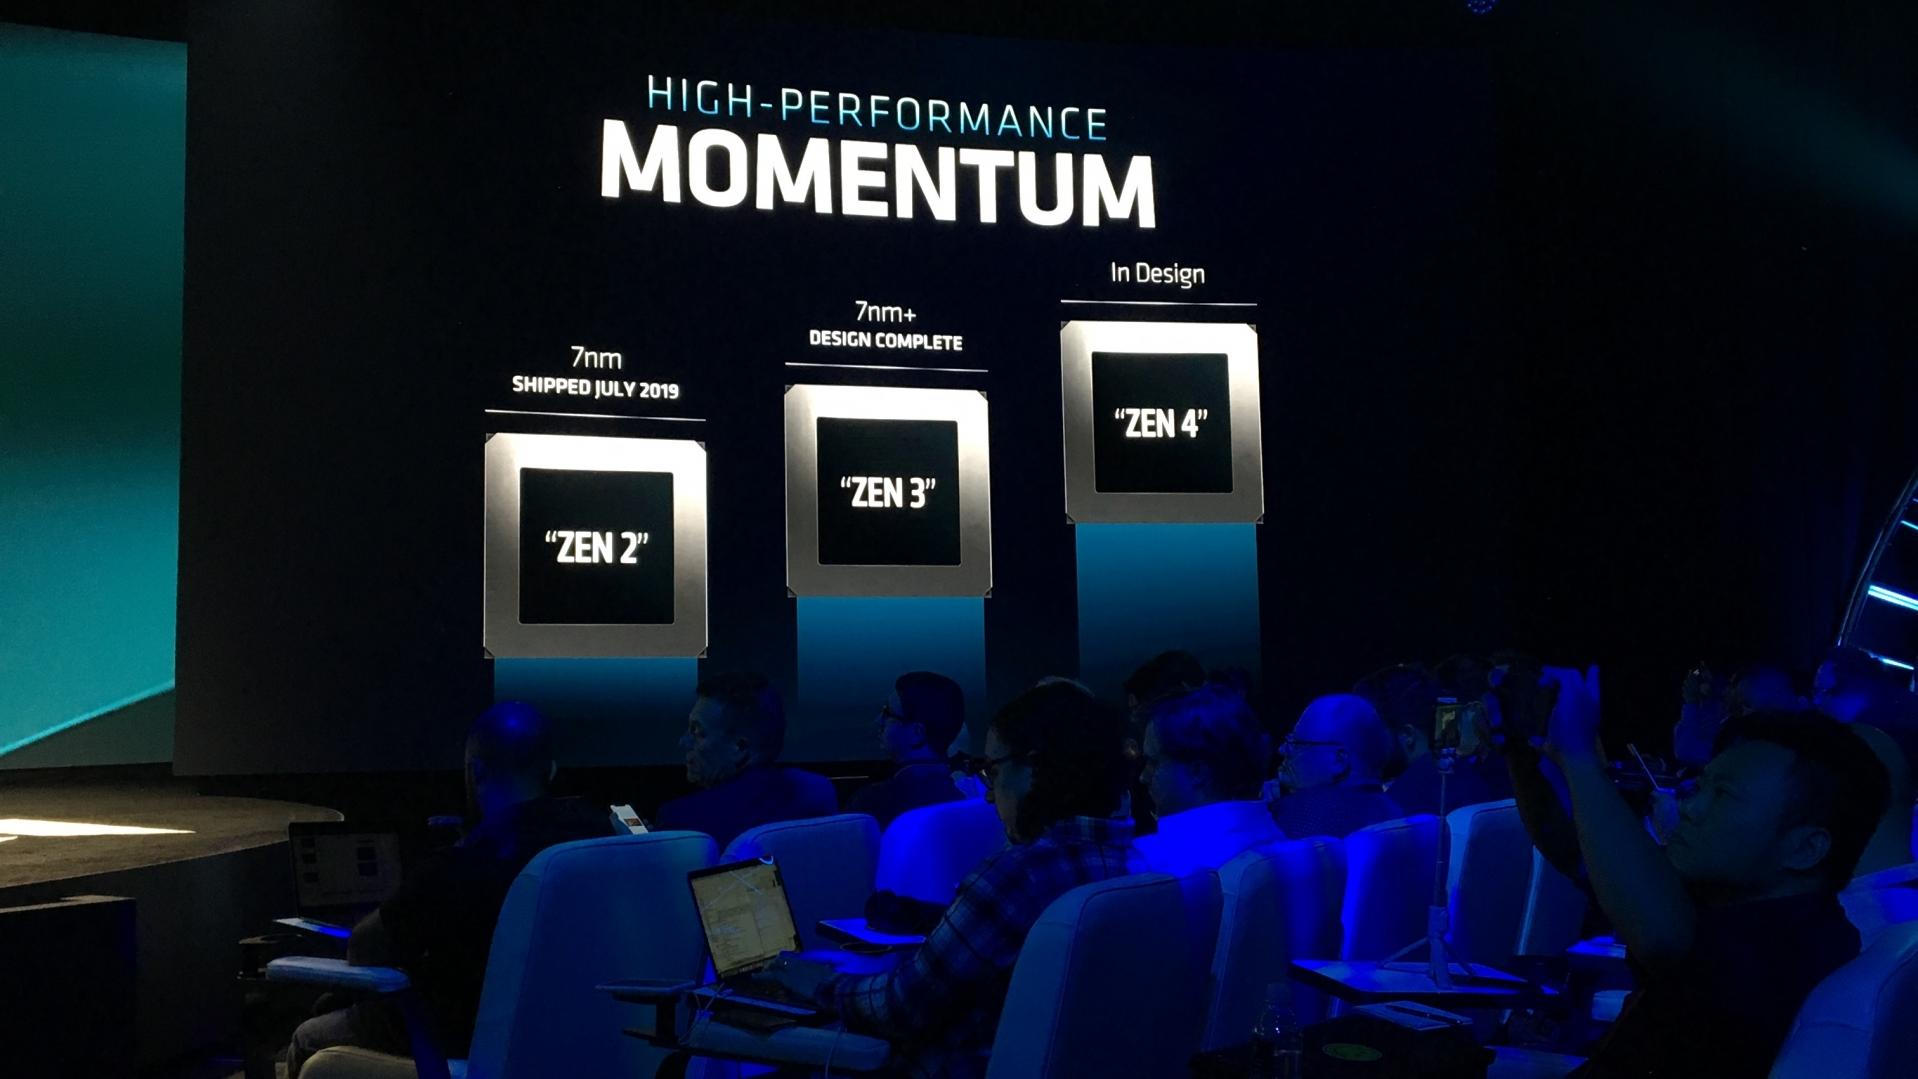 Amd Promises That Zen 3 Milan Processors Will Be Socket Compatible With Zen 2 Epyc Oc3d News